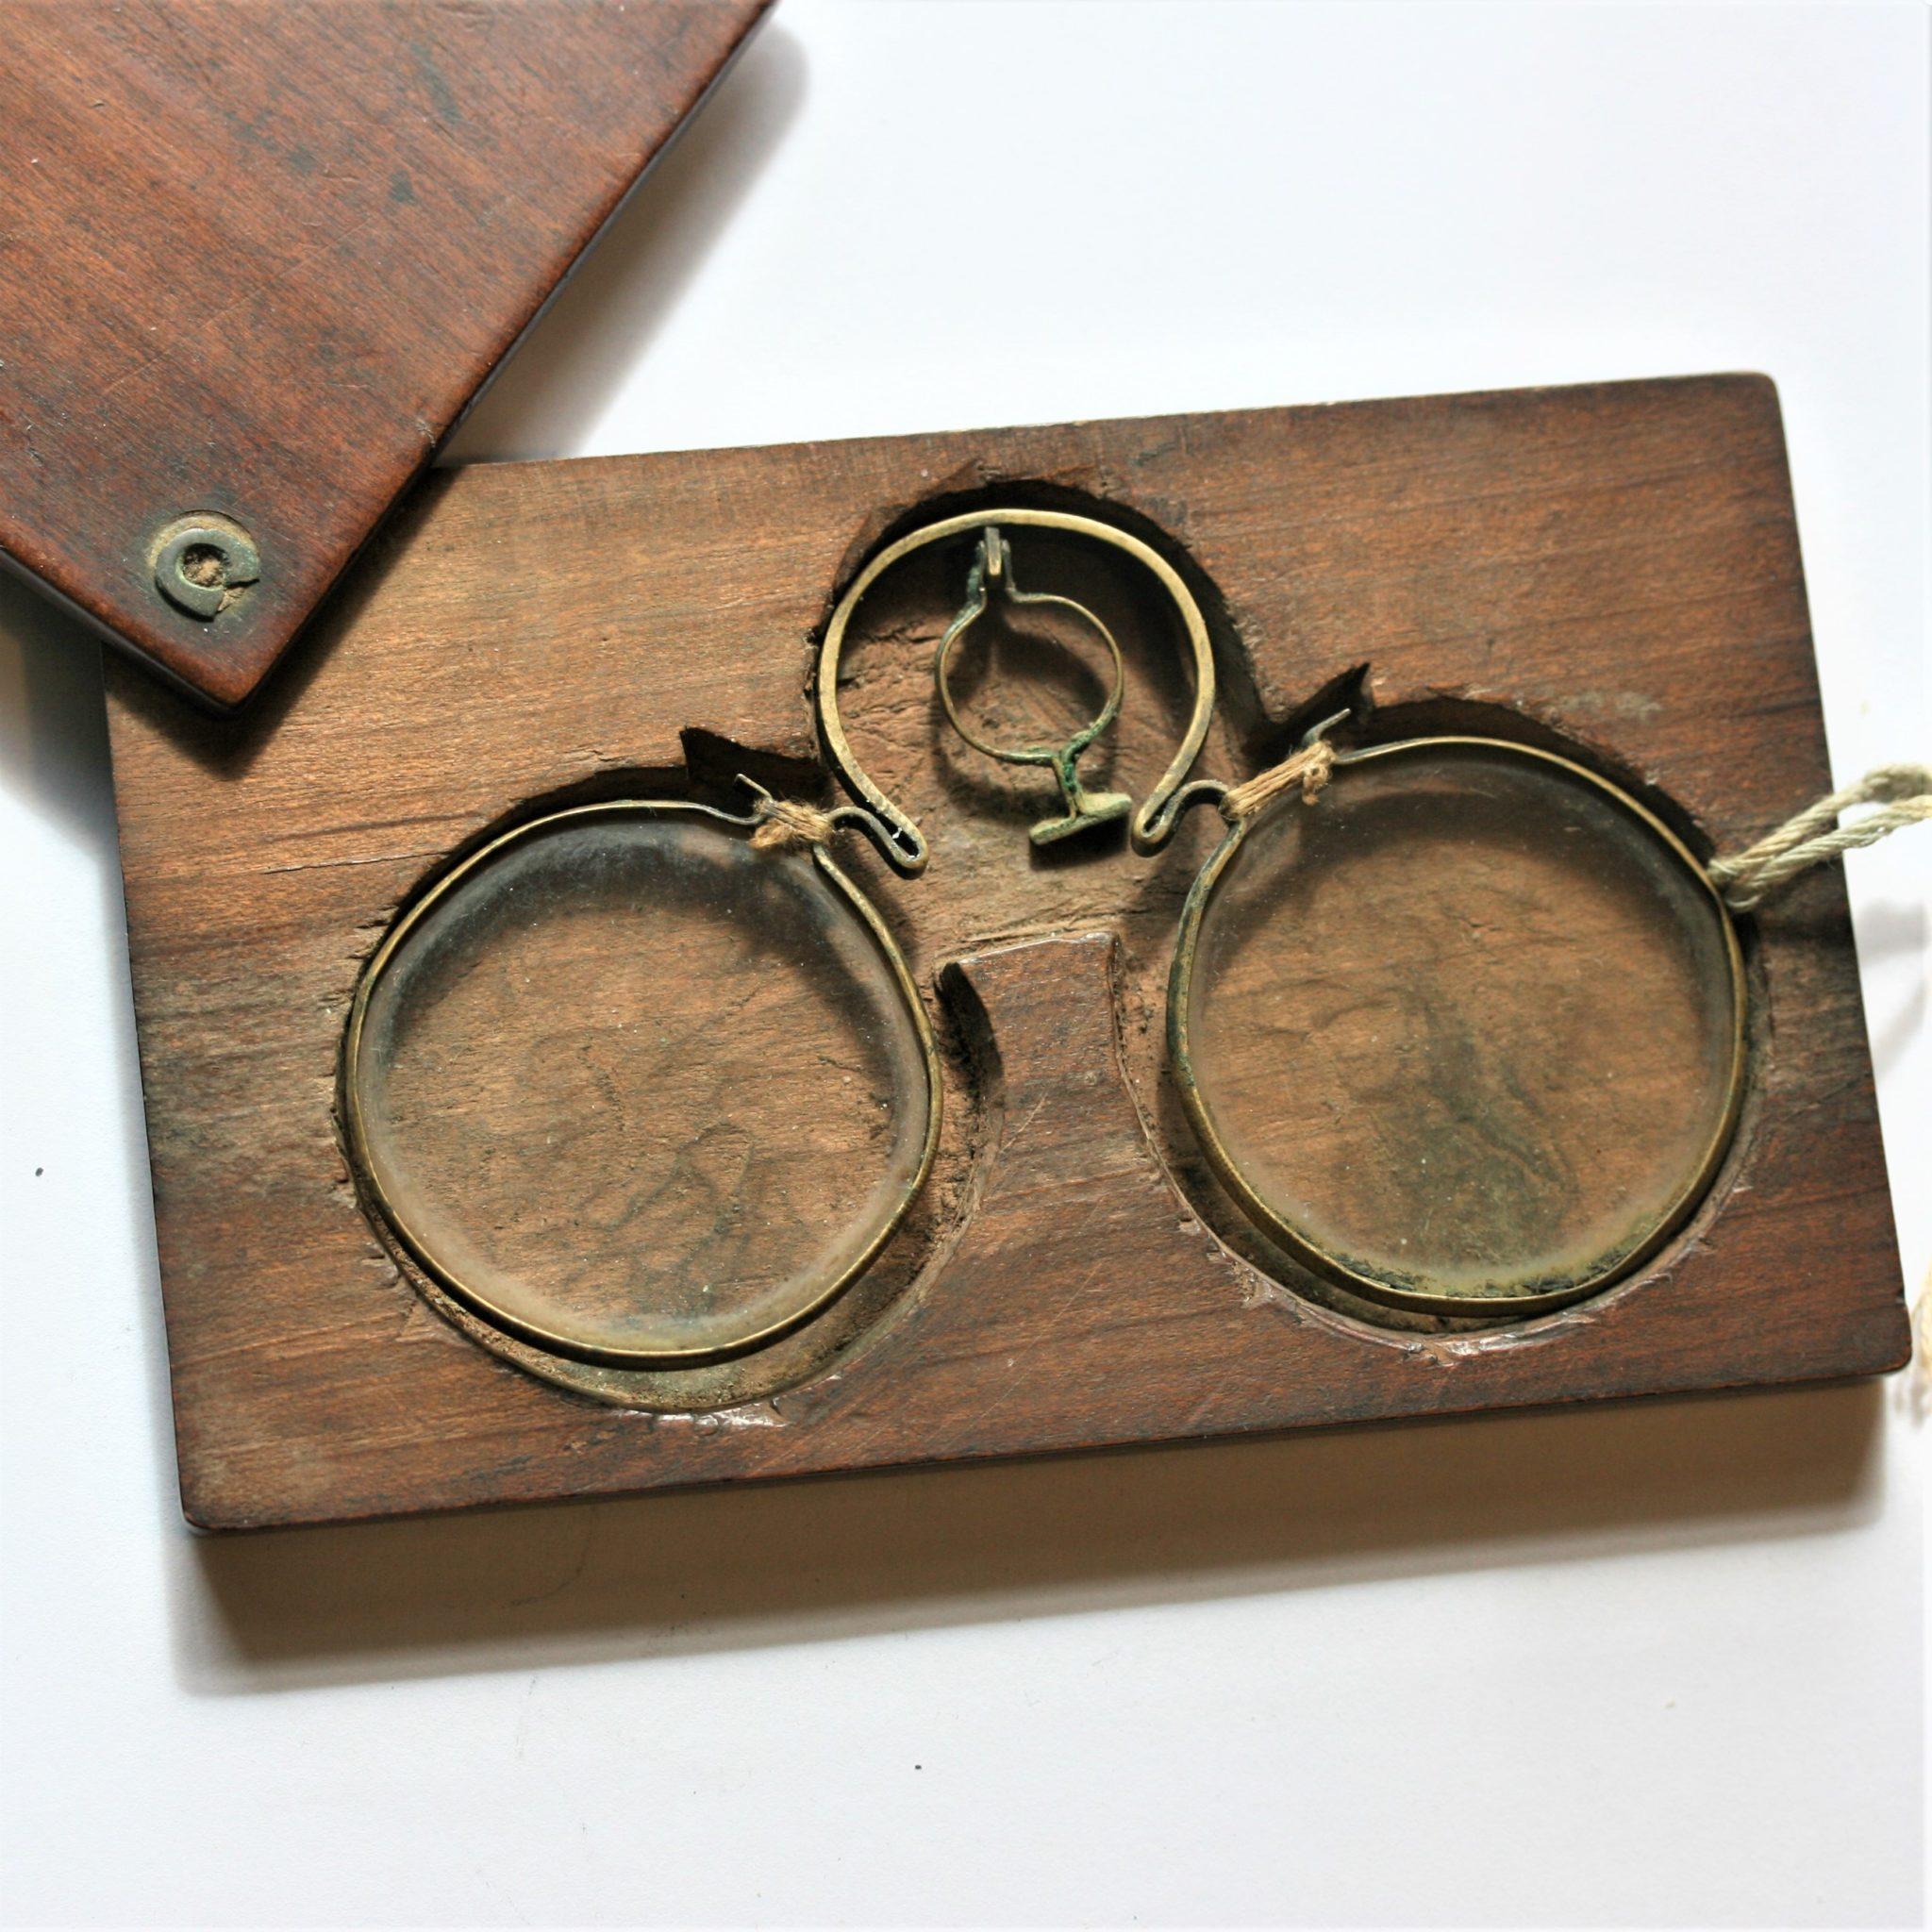 ANTIQUE JAPANESE SPECTACLES IN ORIGINAL WOODEN CASE ETUI C 1720 FOR SALE